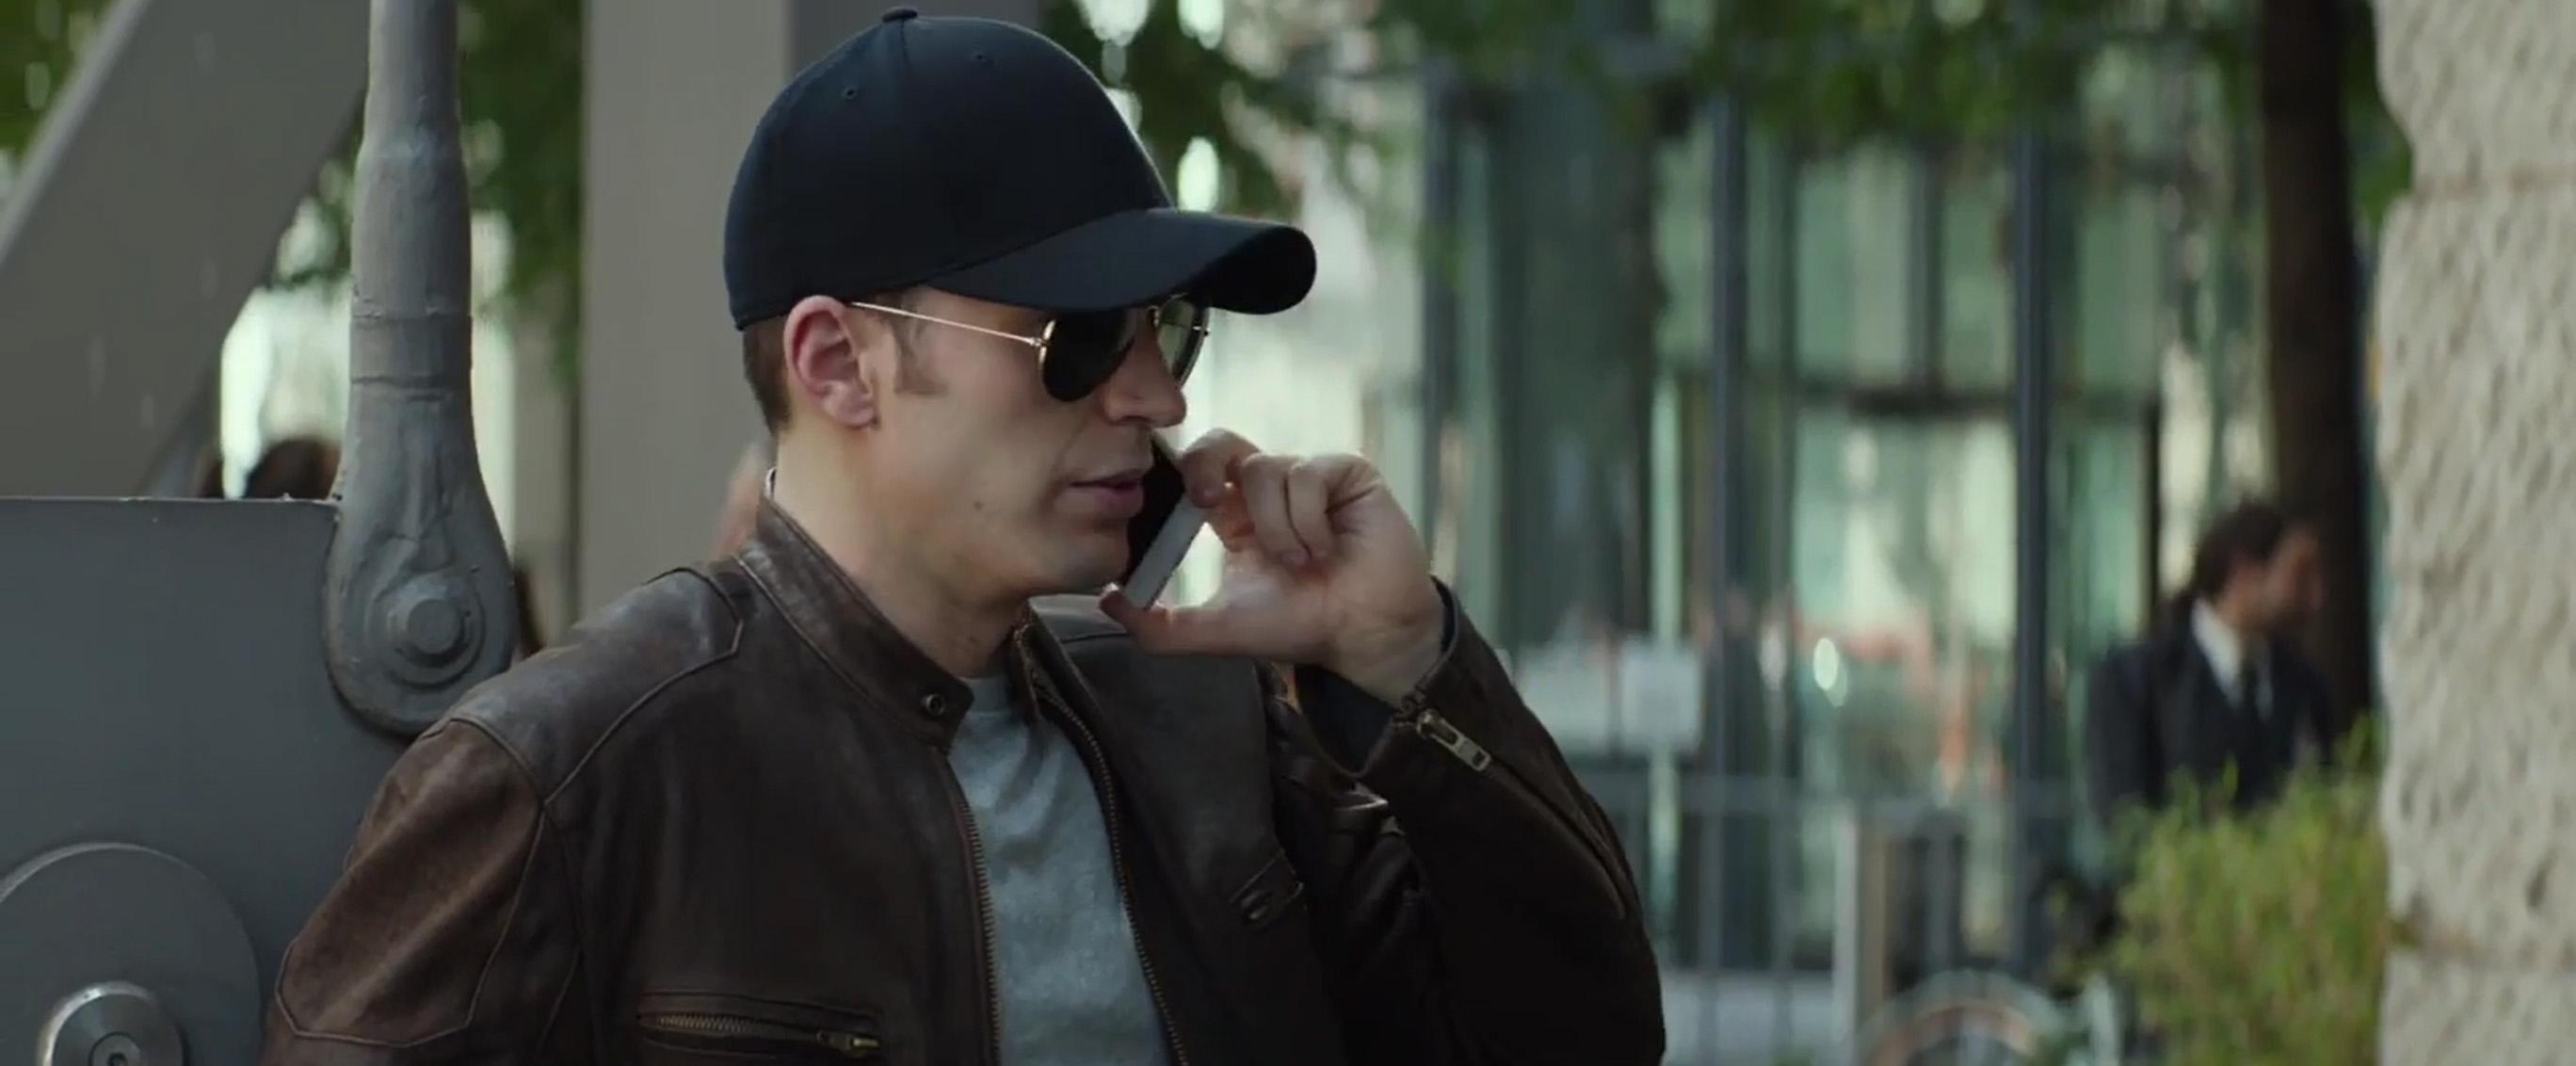 sunglasses and cap for disguise-ის სურათის შედეგი